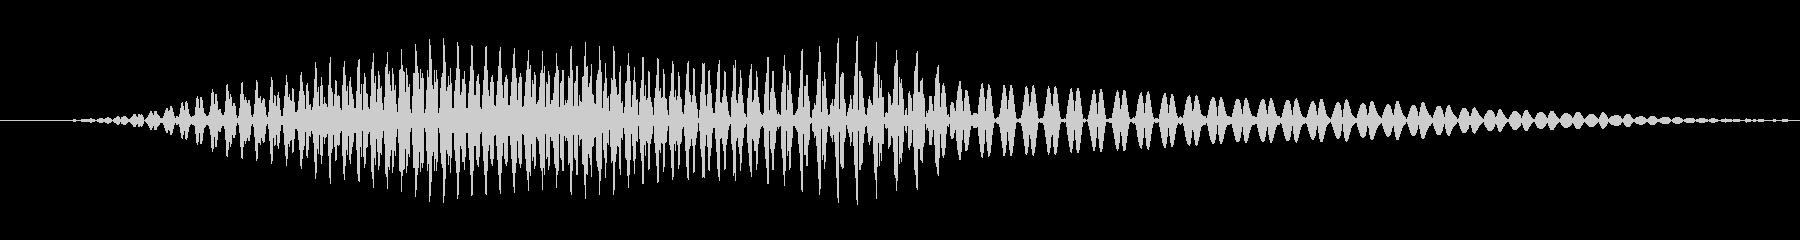 1 (One, ワン、米国女性声優:K…の未再生の波形